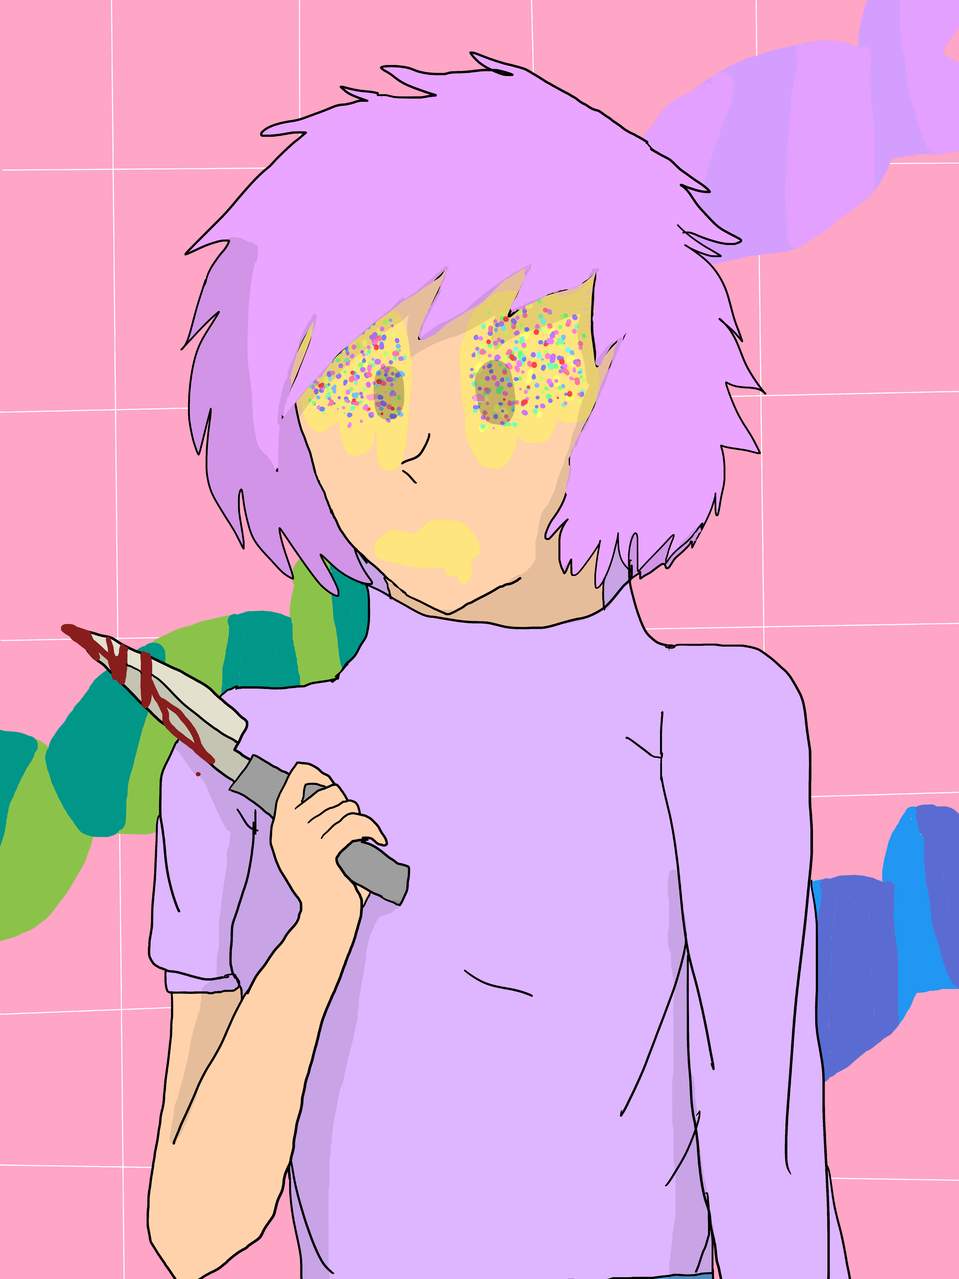 pink bubble gum girl- Illust of Lil devil/ KIttydoll mode pinkhair